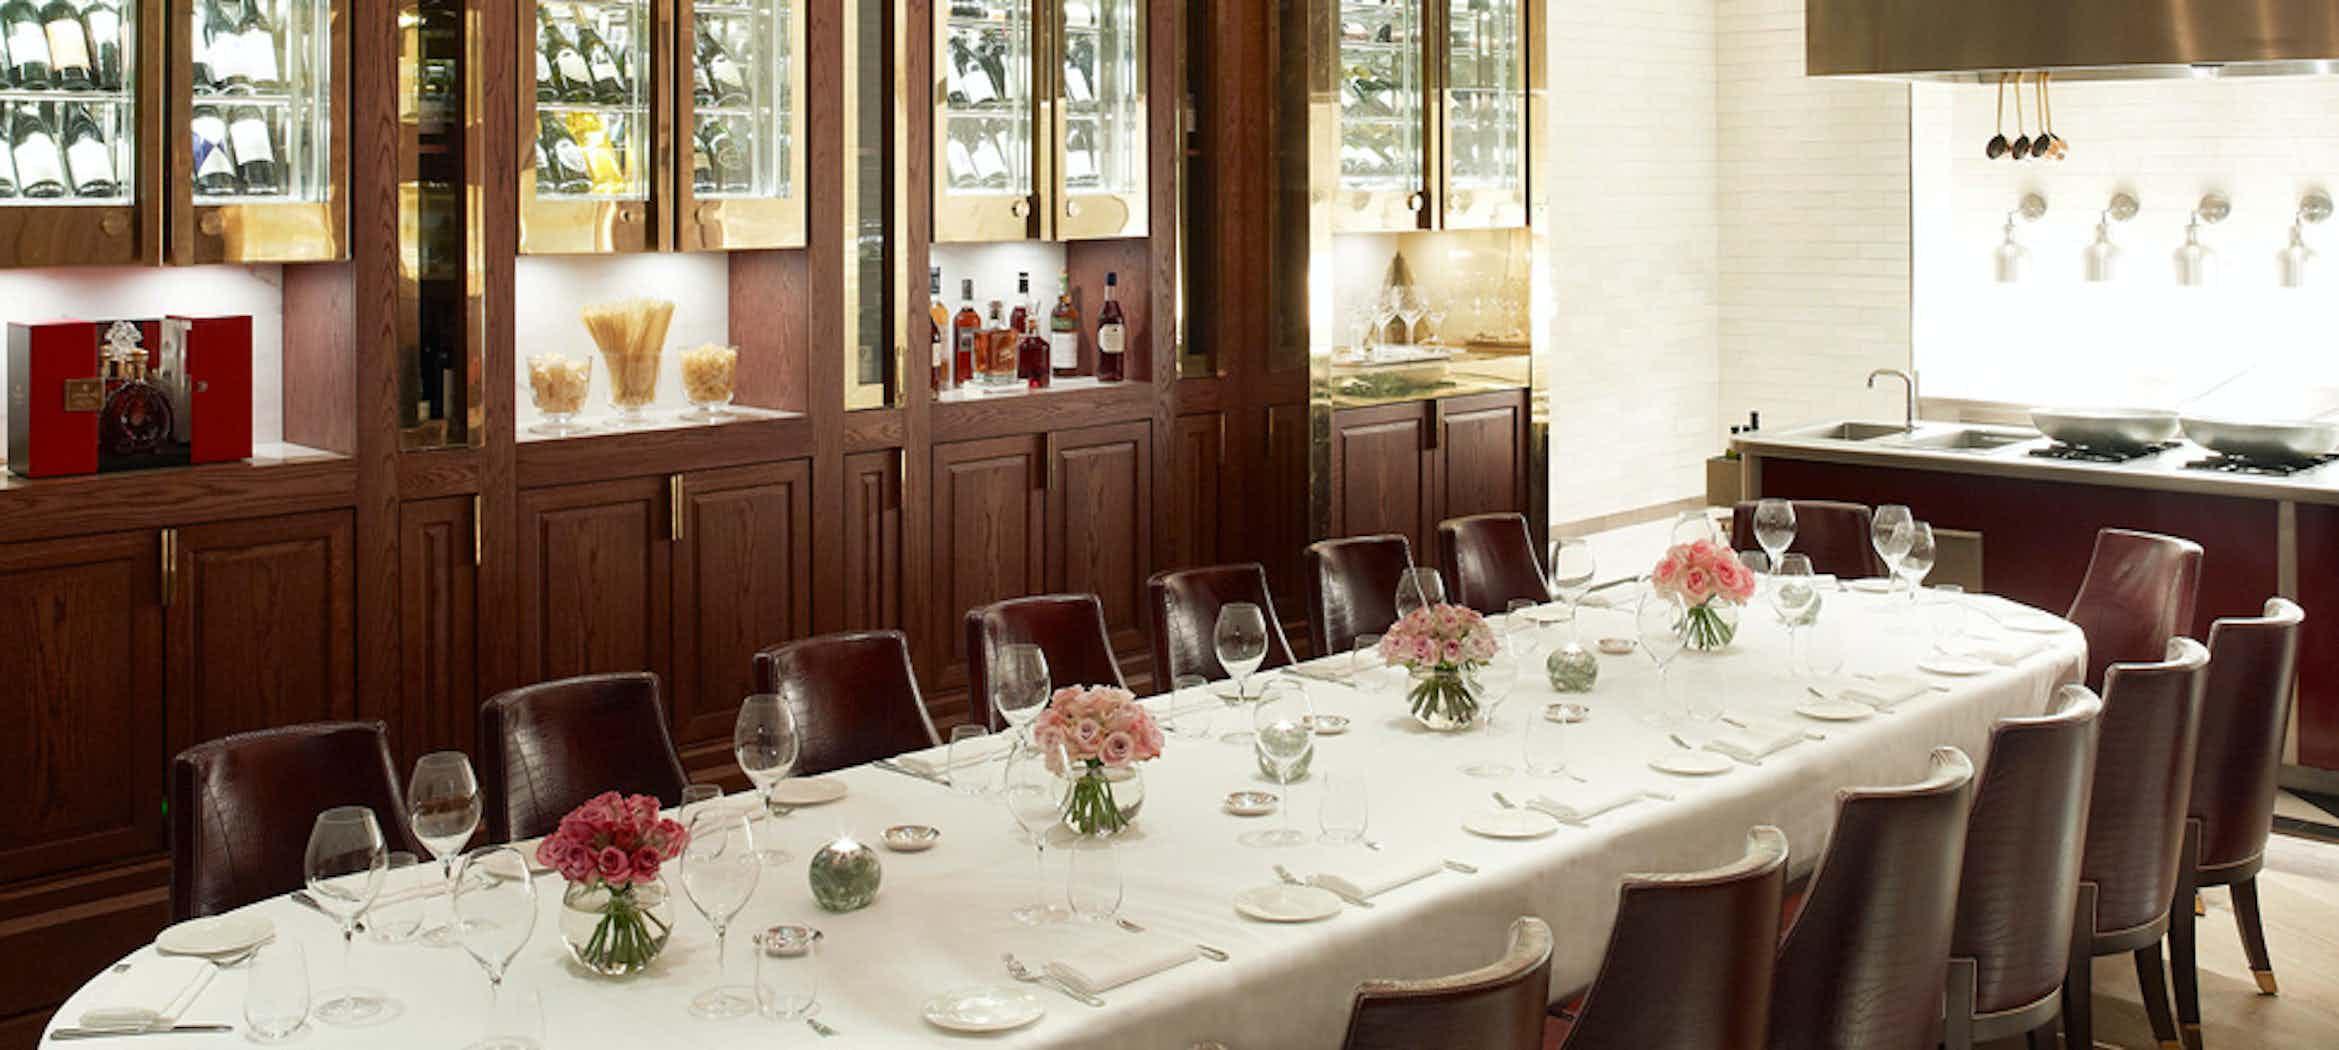 Massimo Private Dining Room, Corinthia Hotel